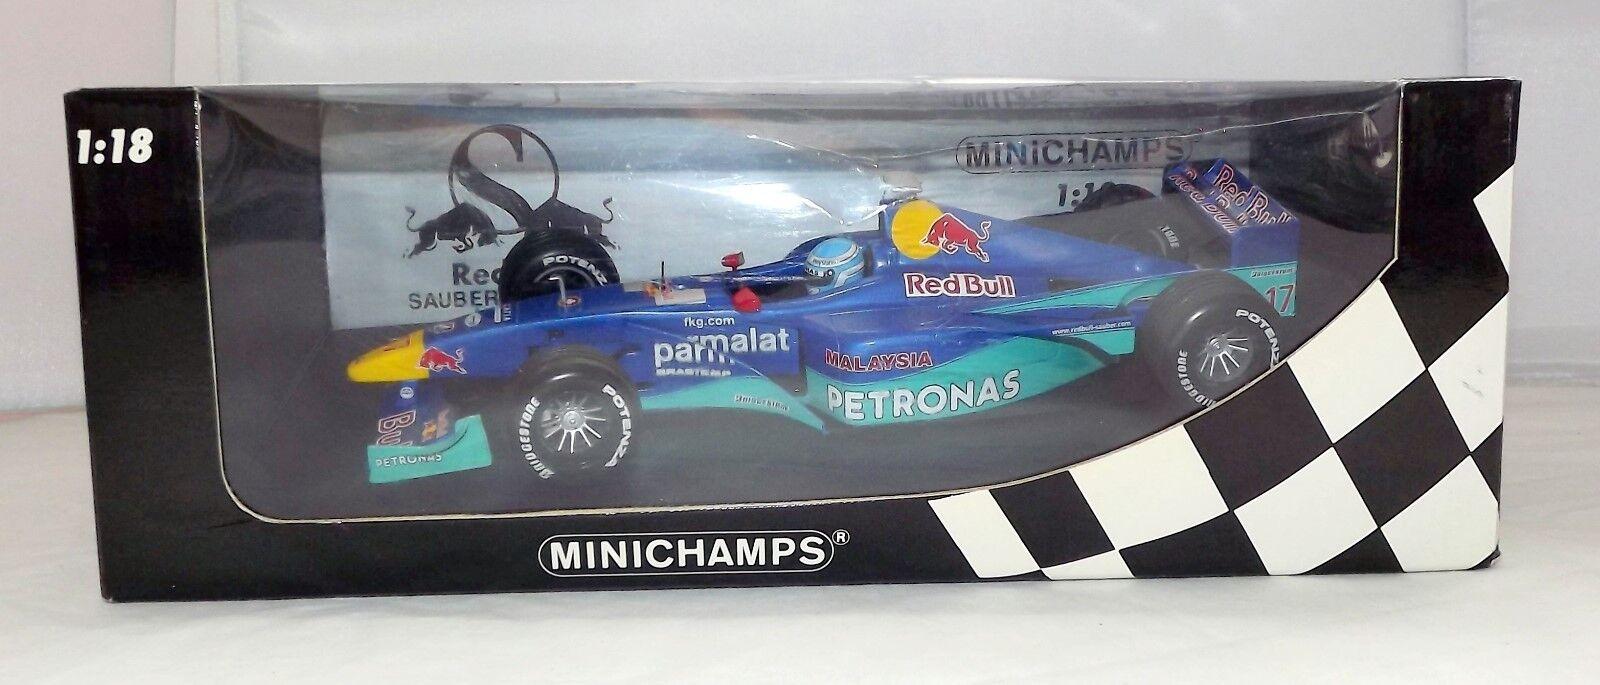 Minichamps 1 18 Saber F1 Team M Salo 2000 ,180000017, boxed - Free post